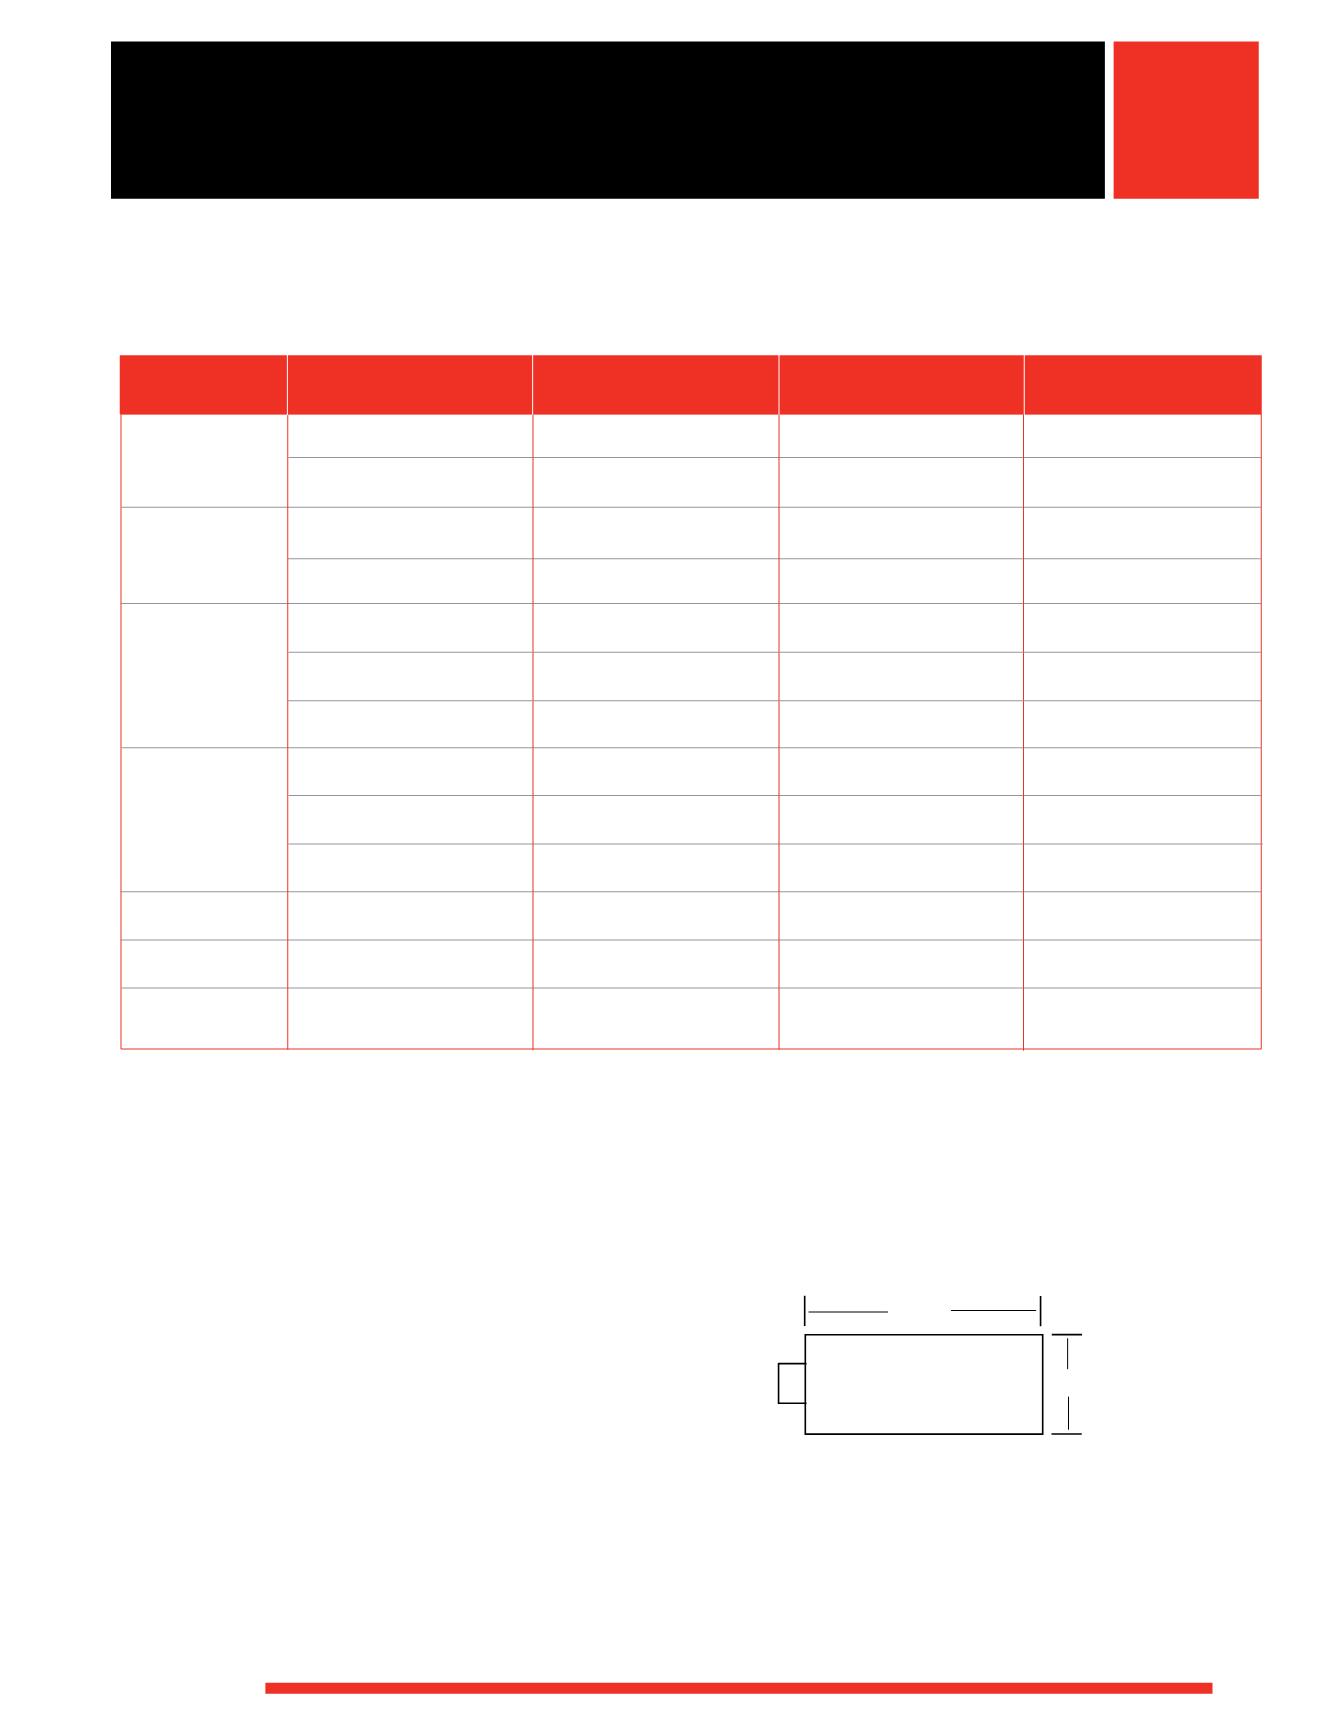 chromalox heater wiring diagram 0v between hot and neutral watlow